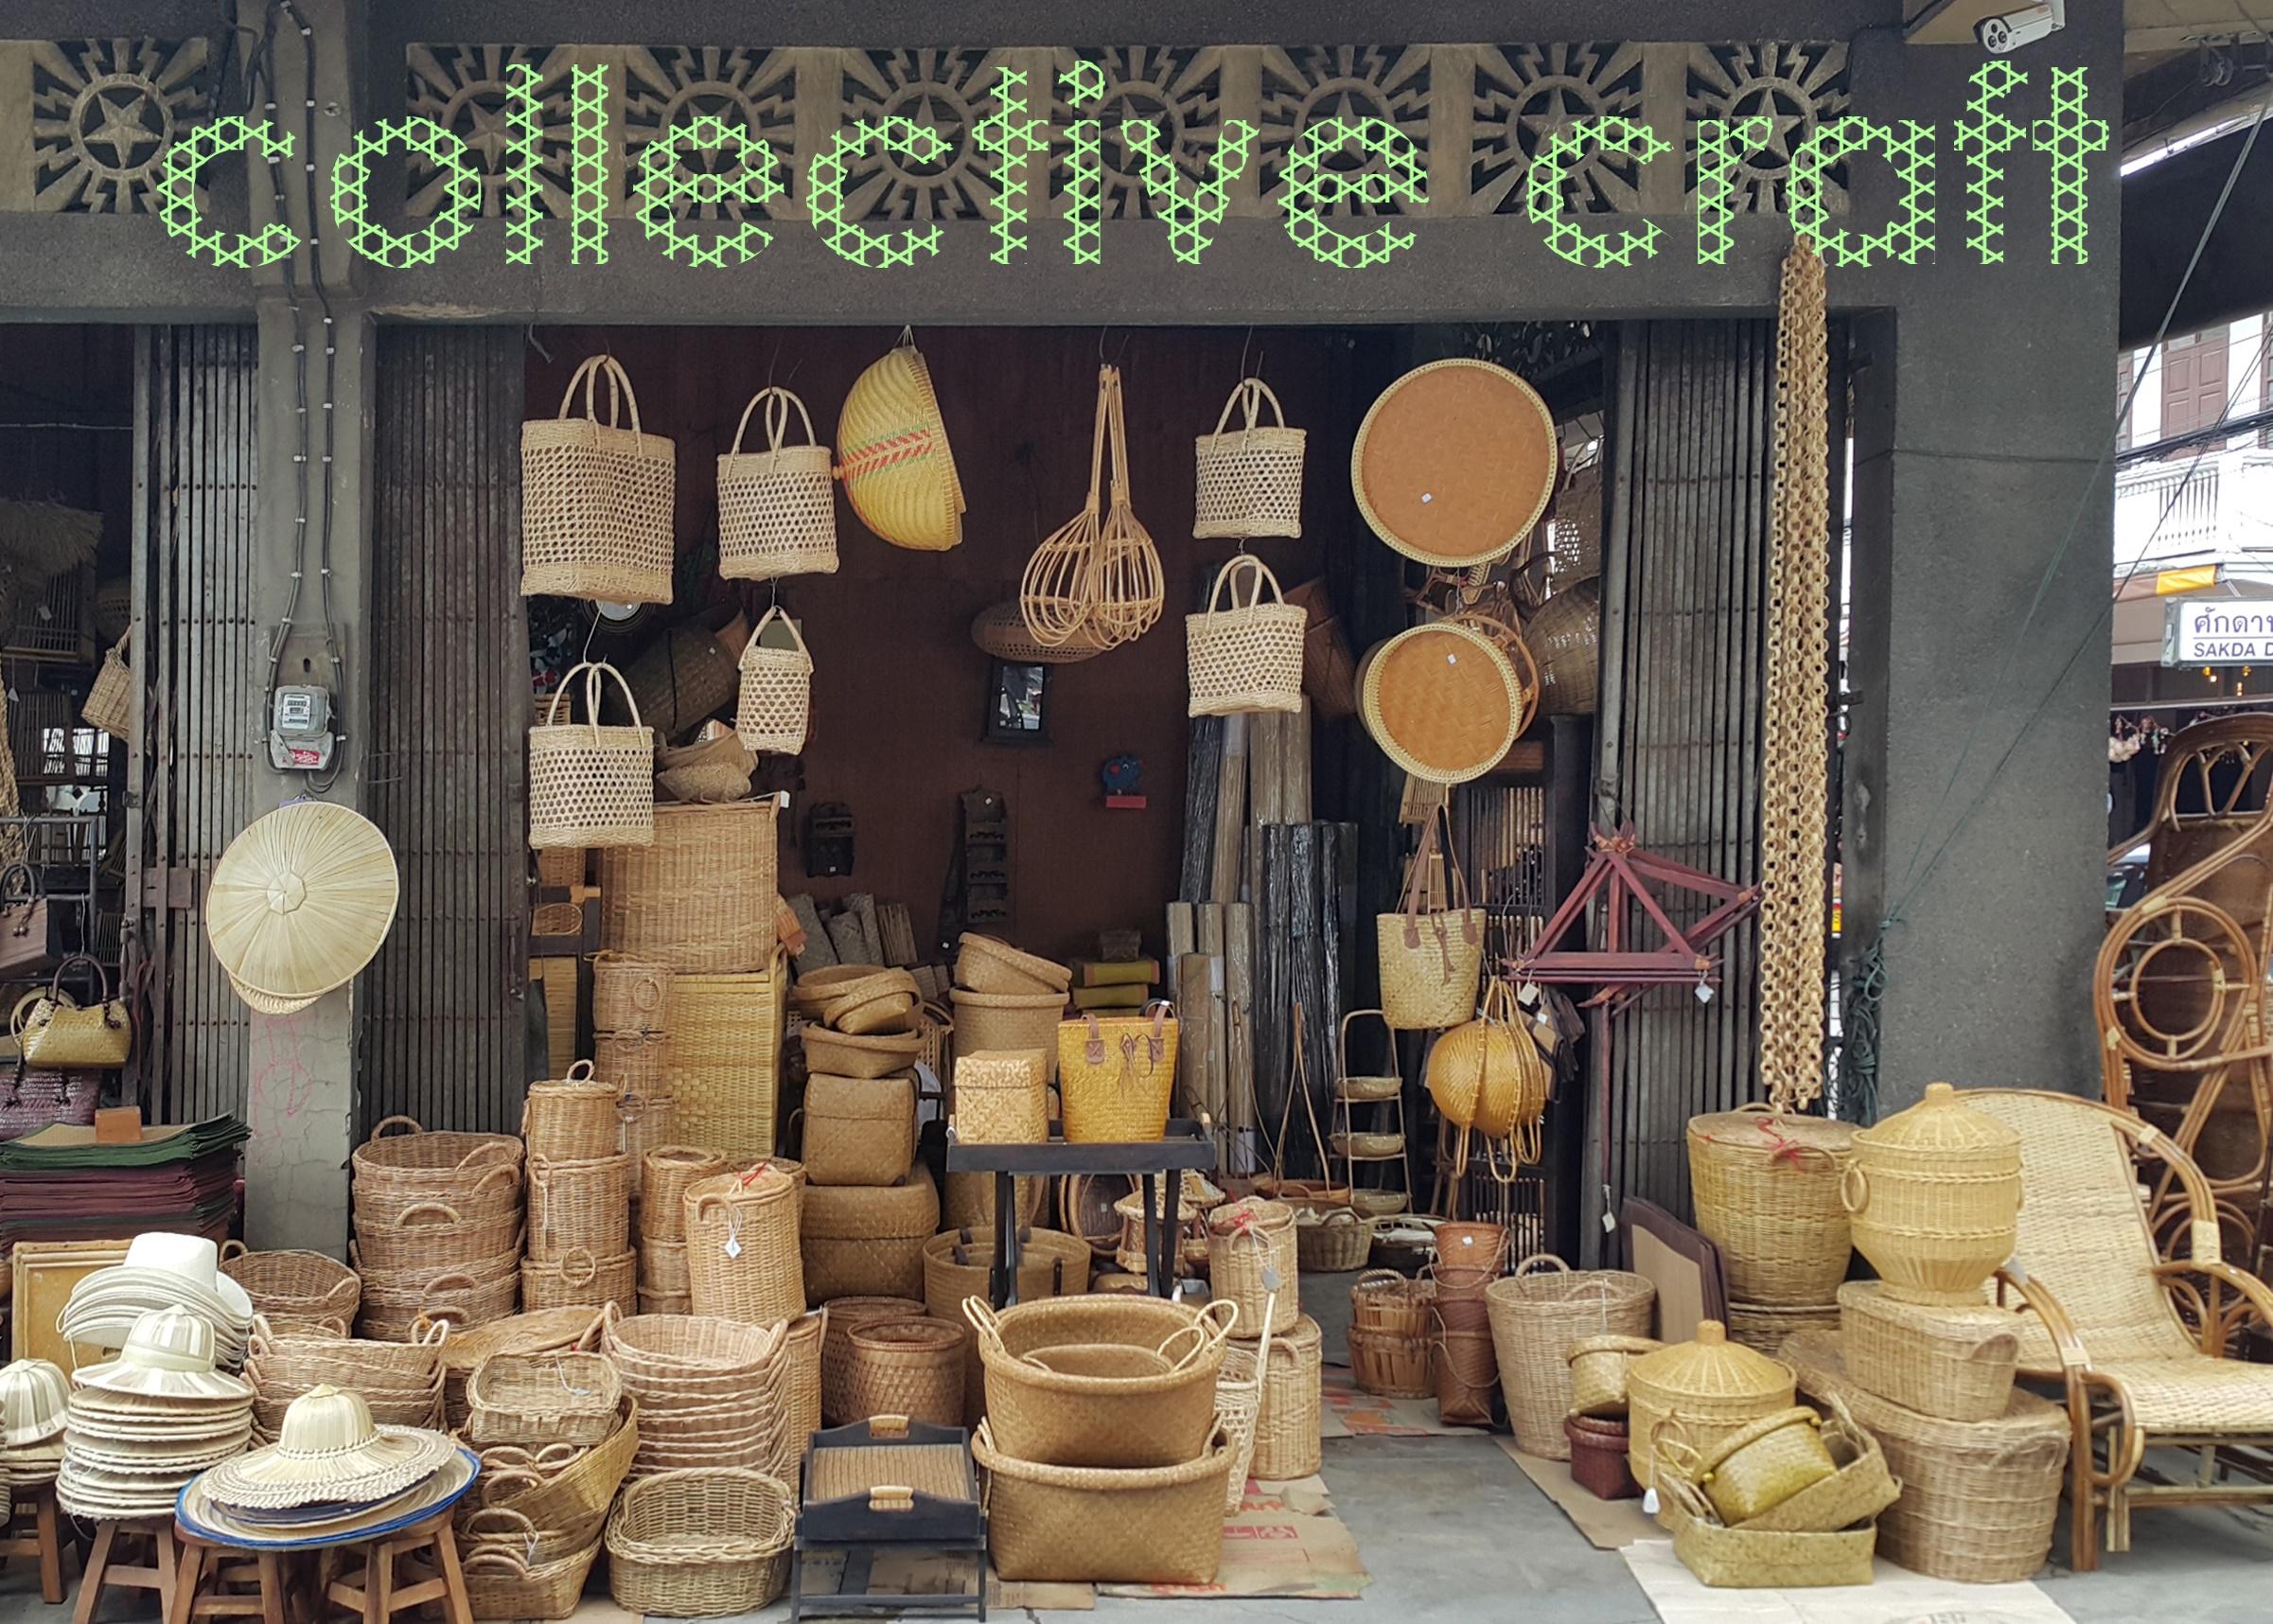 Plural-designs-A-Collective-craft_Key-visual-crop.jpg